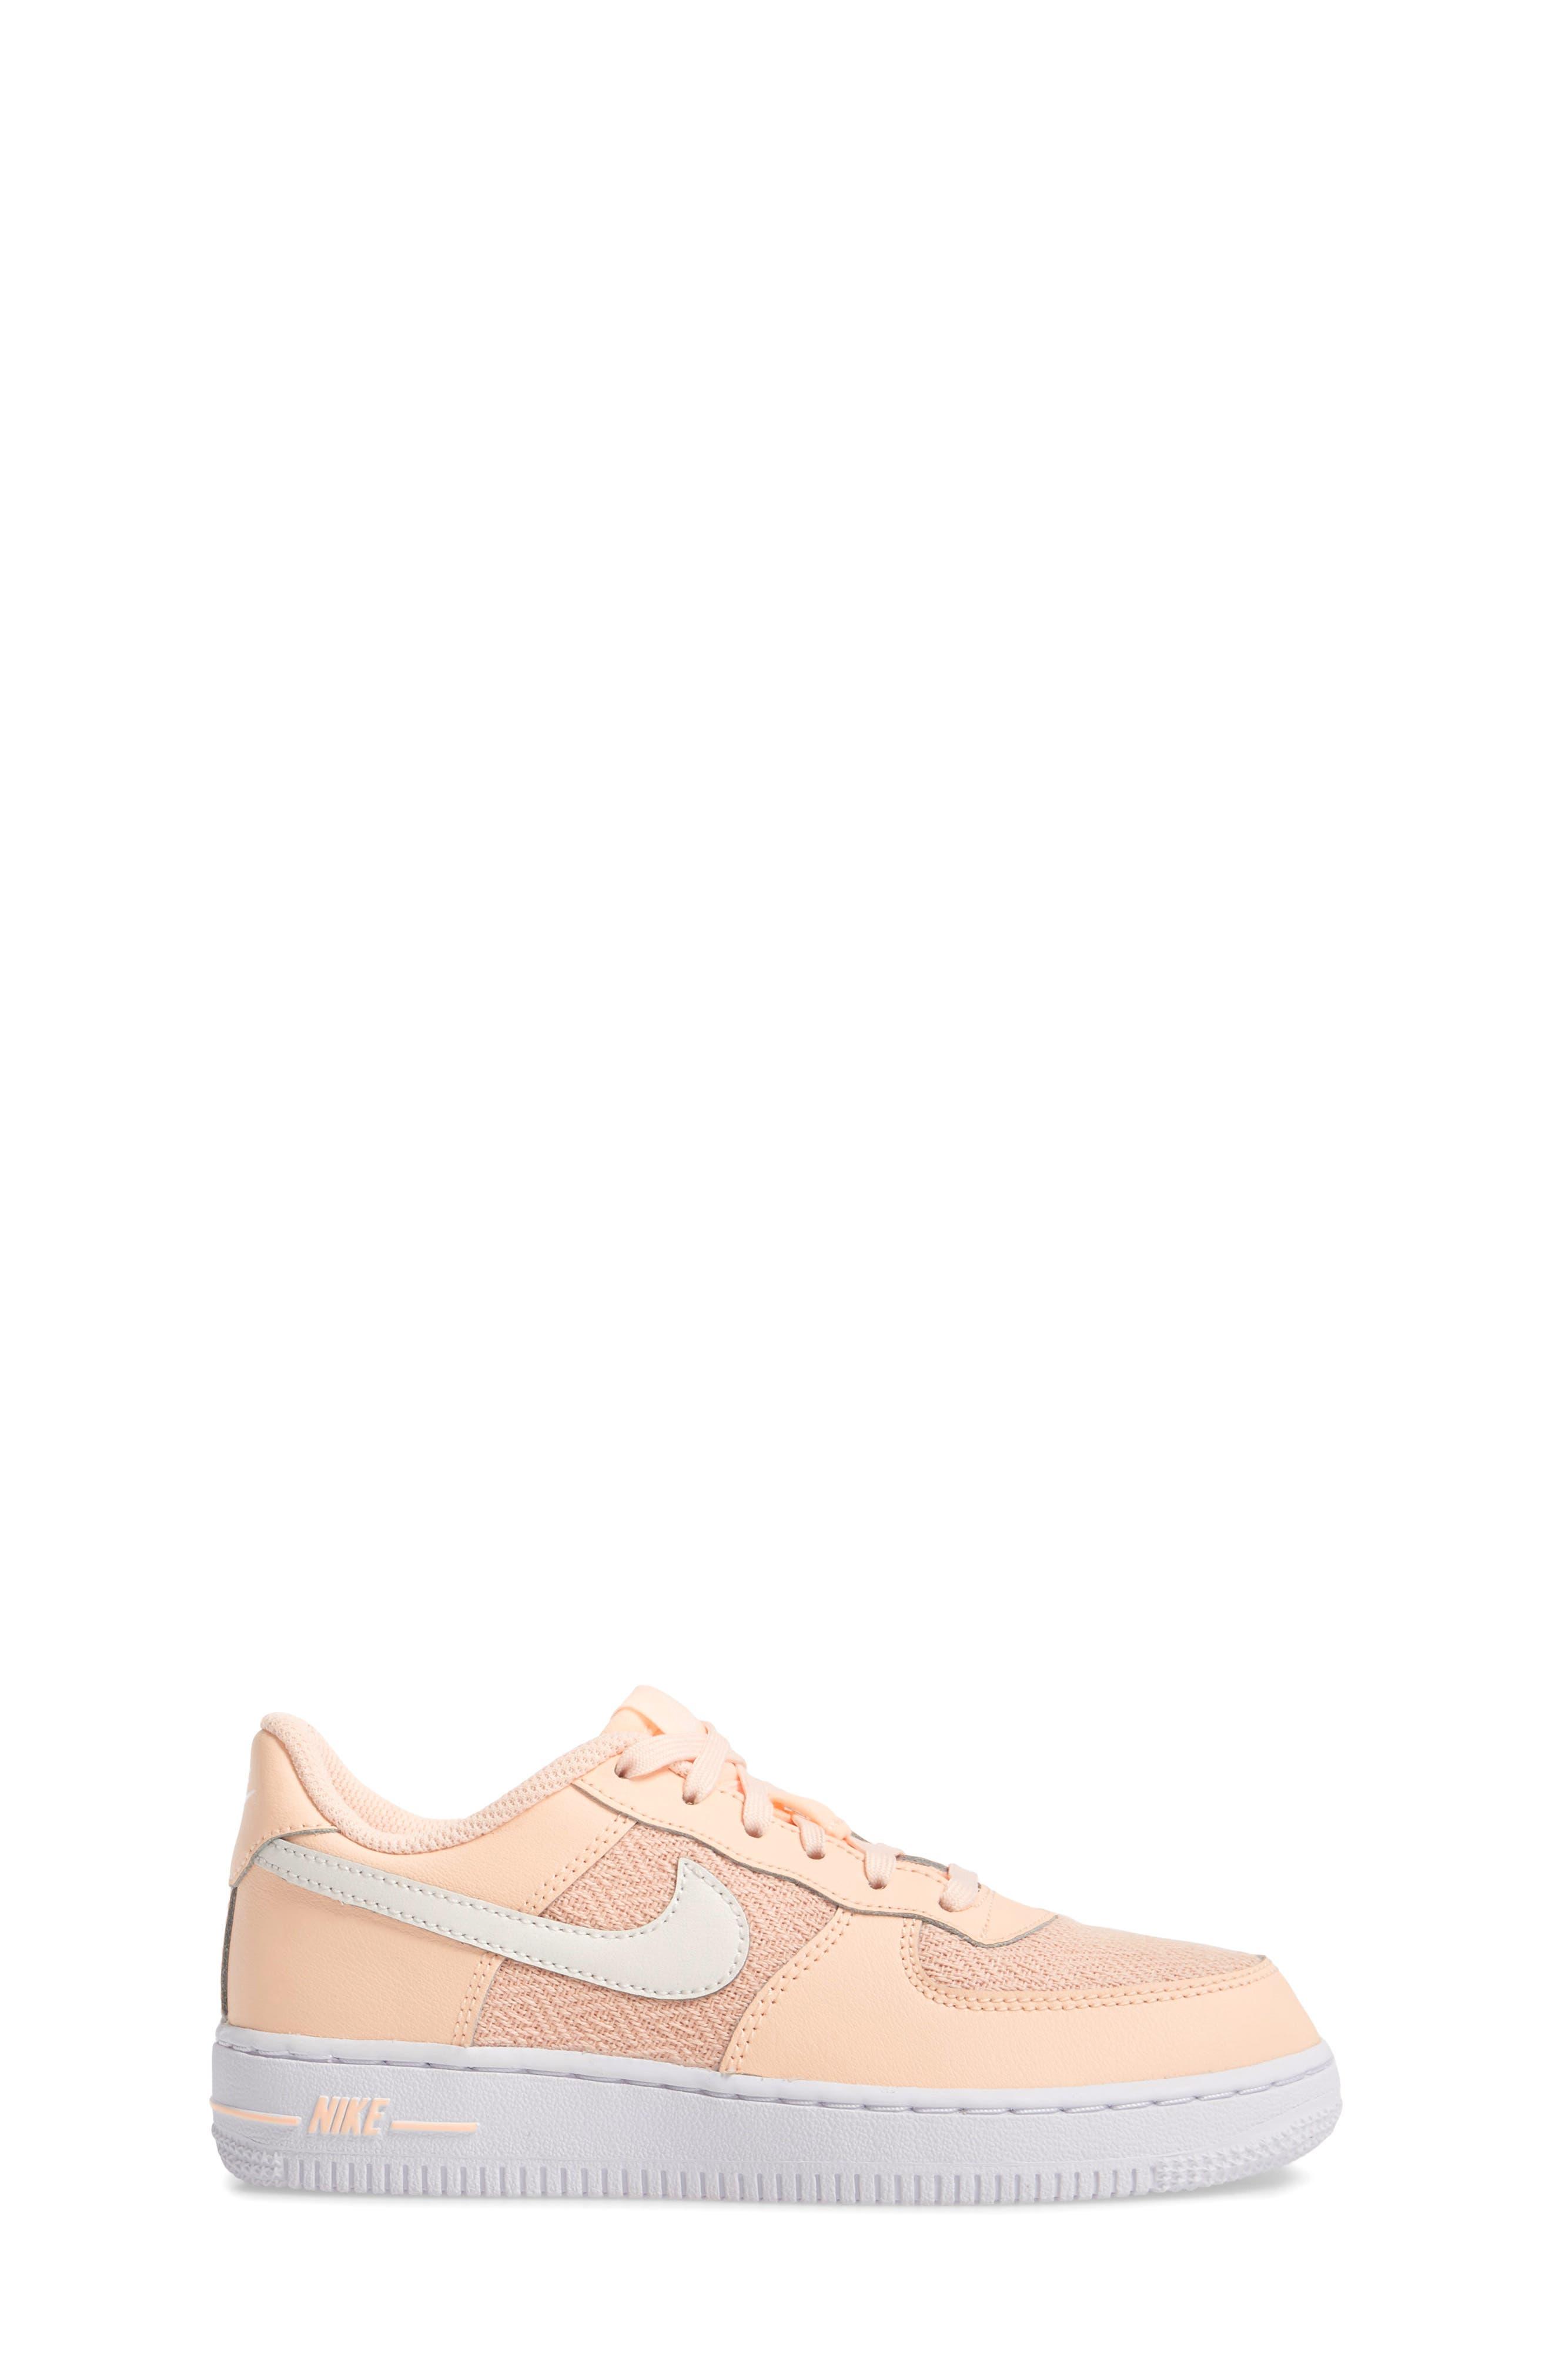 Air Force 1 LV8 Sneaker,                             Alternate thumbnail 3, color,                             Crimson Tint/ Sail/ White